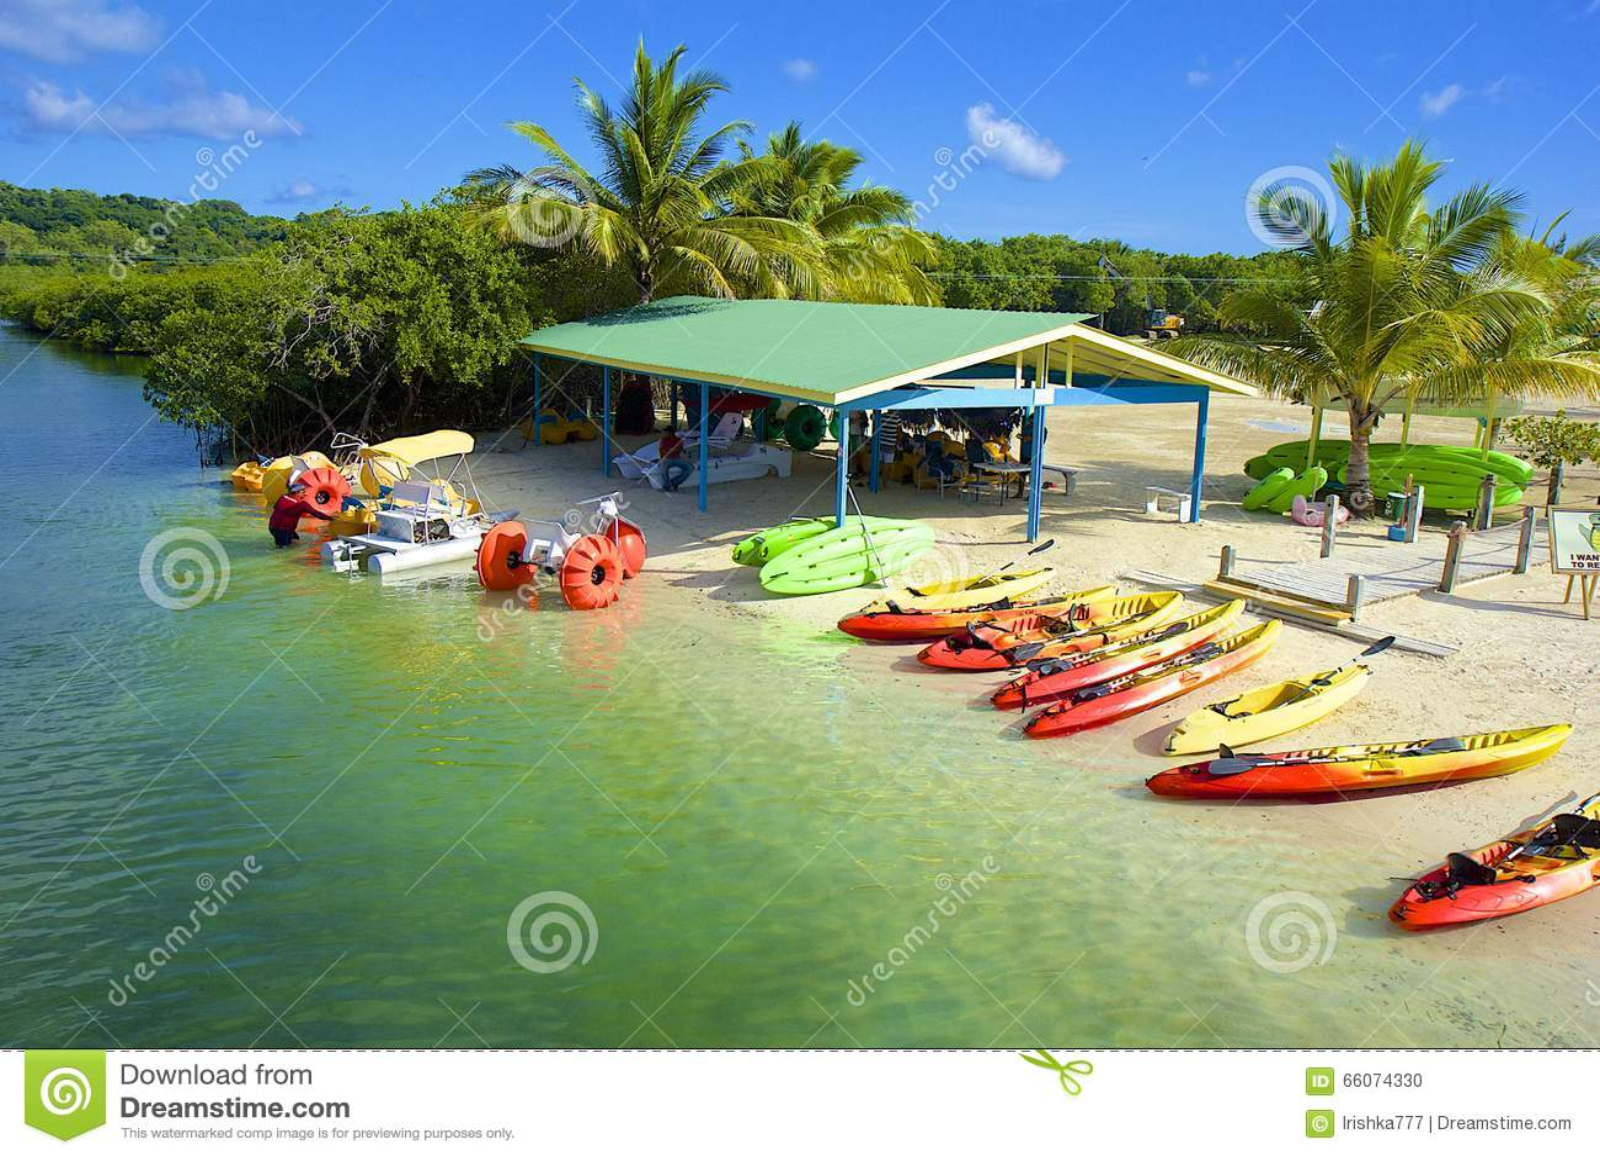 Watersports in baia di mogano in Roatan, Honduras